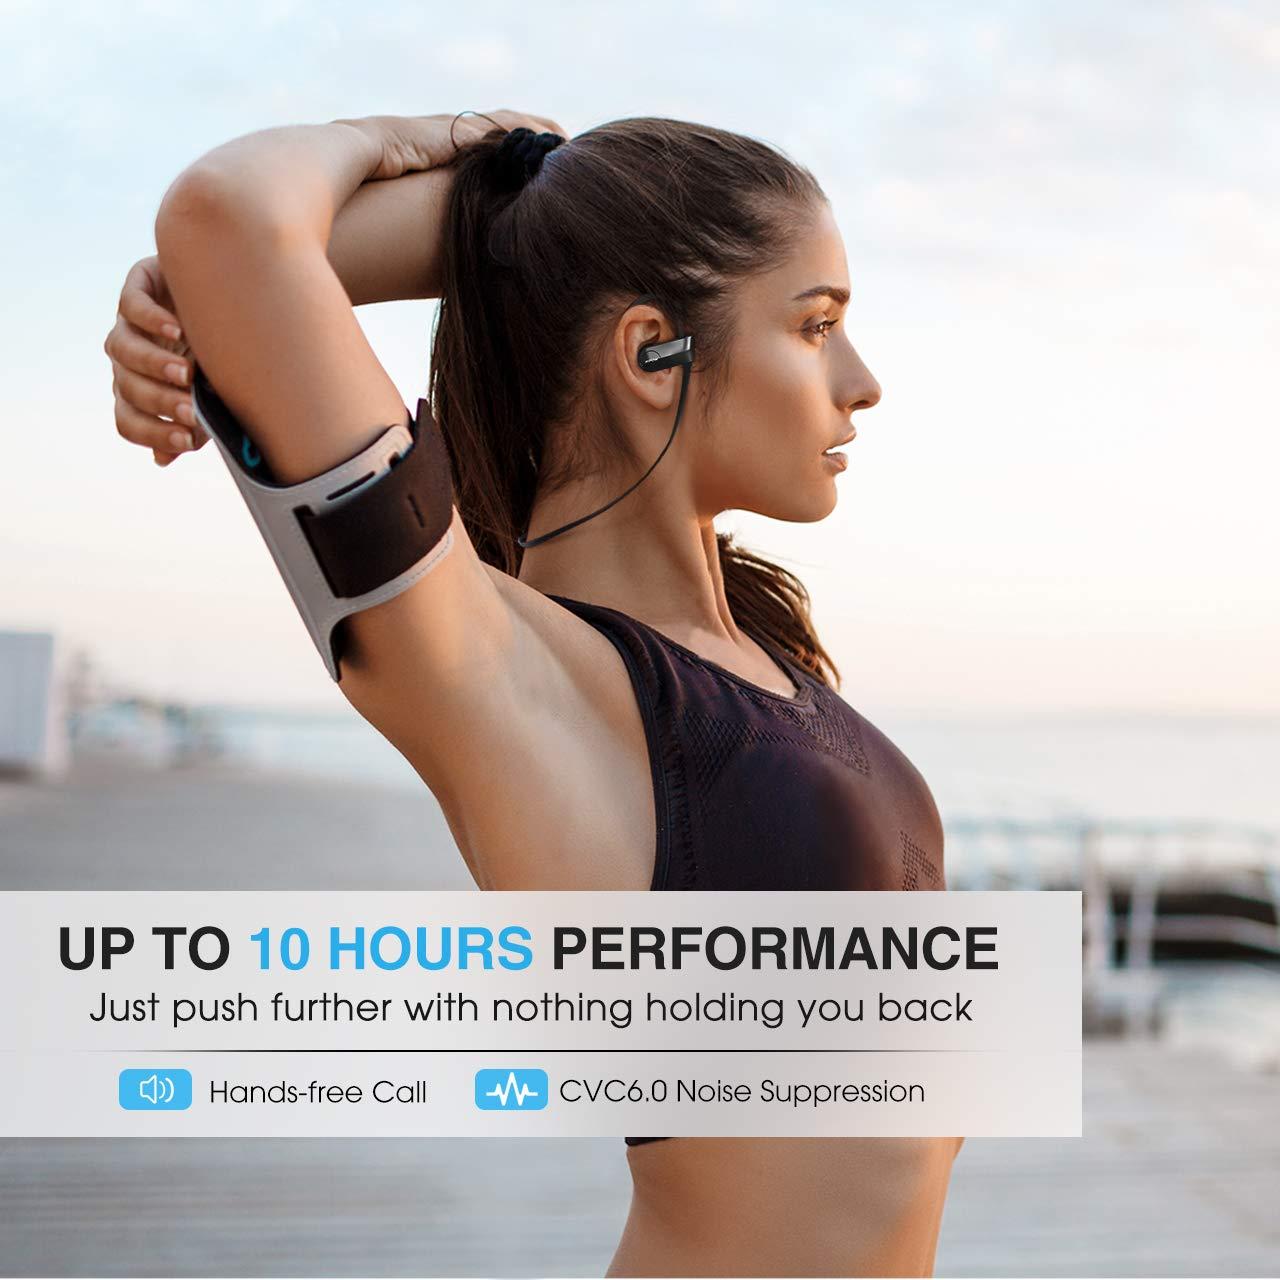 Mpow D7 Bluetooth Headphones Sport, 10H Playtime & IPX7 Waterproof Wireless Headphones Sport Earbuds W/Bass Stereo Sound, Running Headphones Bluetooth Earphones W/CVC 6.0 Noise Cancelling Mic, Black by Mpow (Image #3)